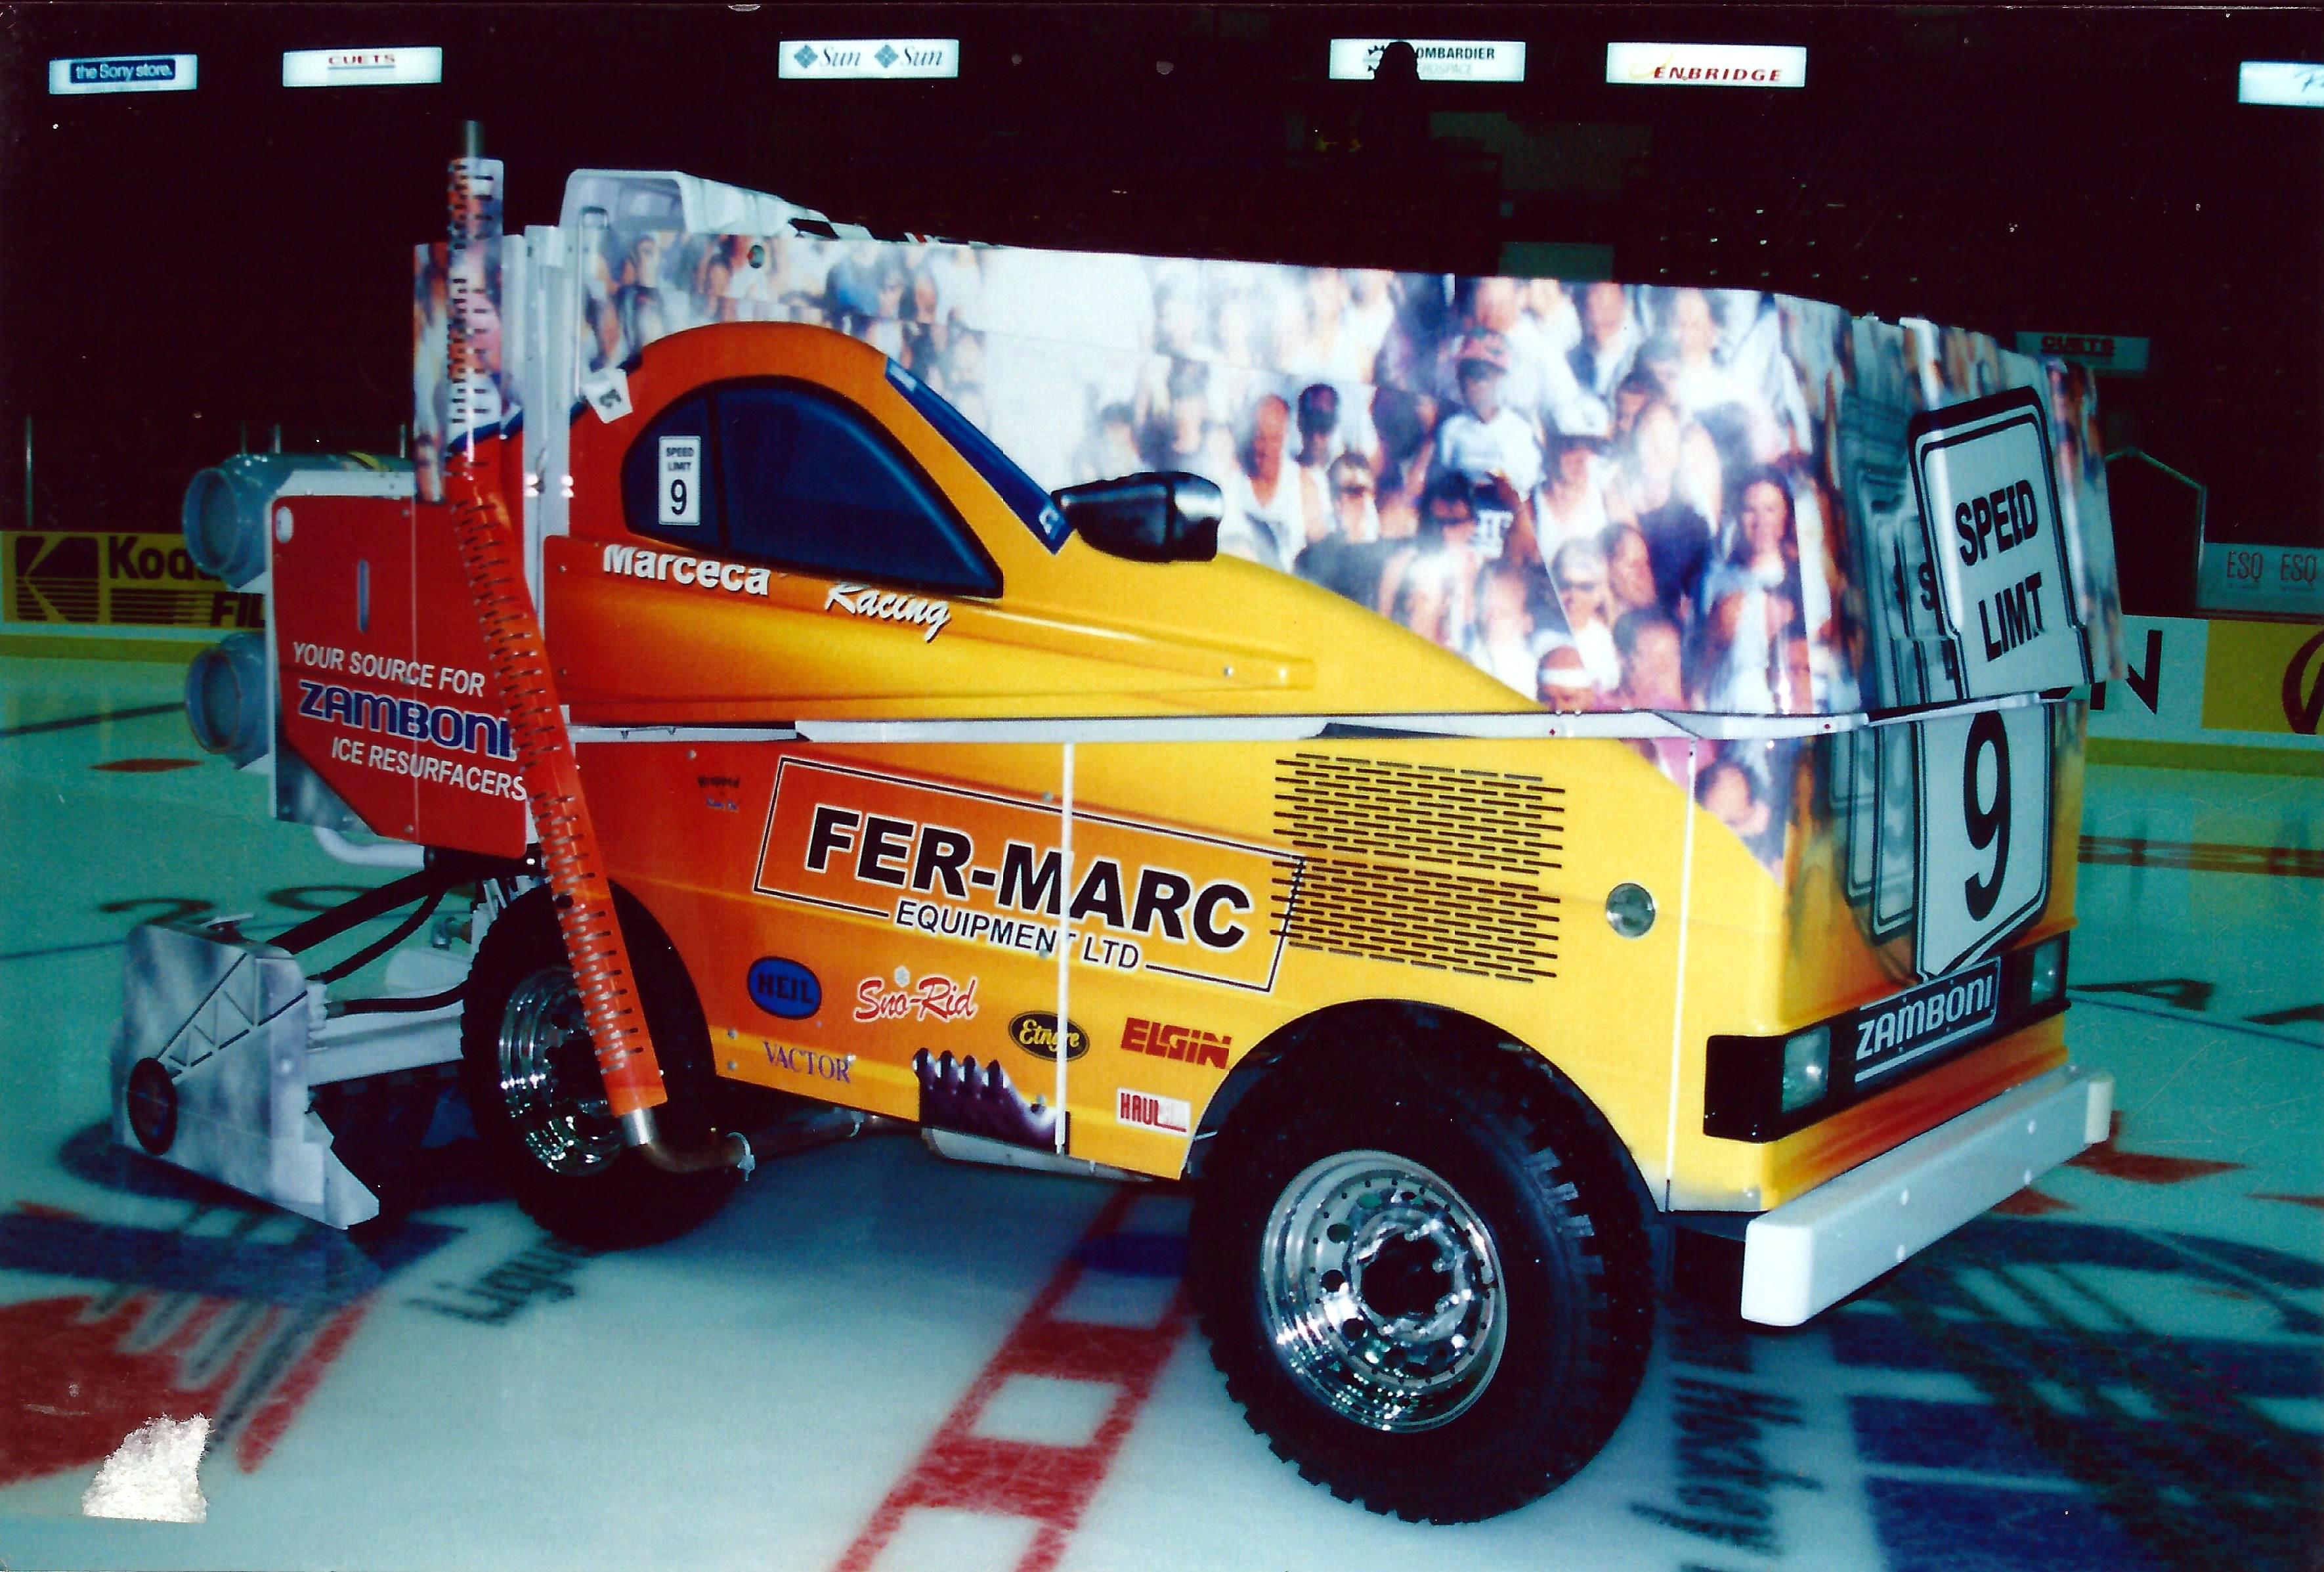 Marceca Racing Zamboni 1